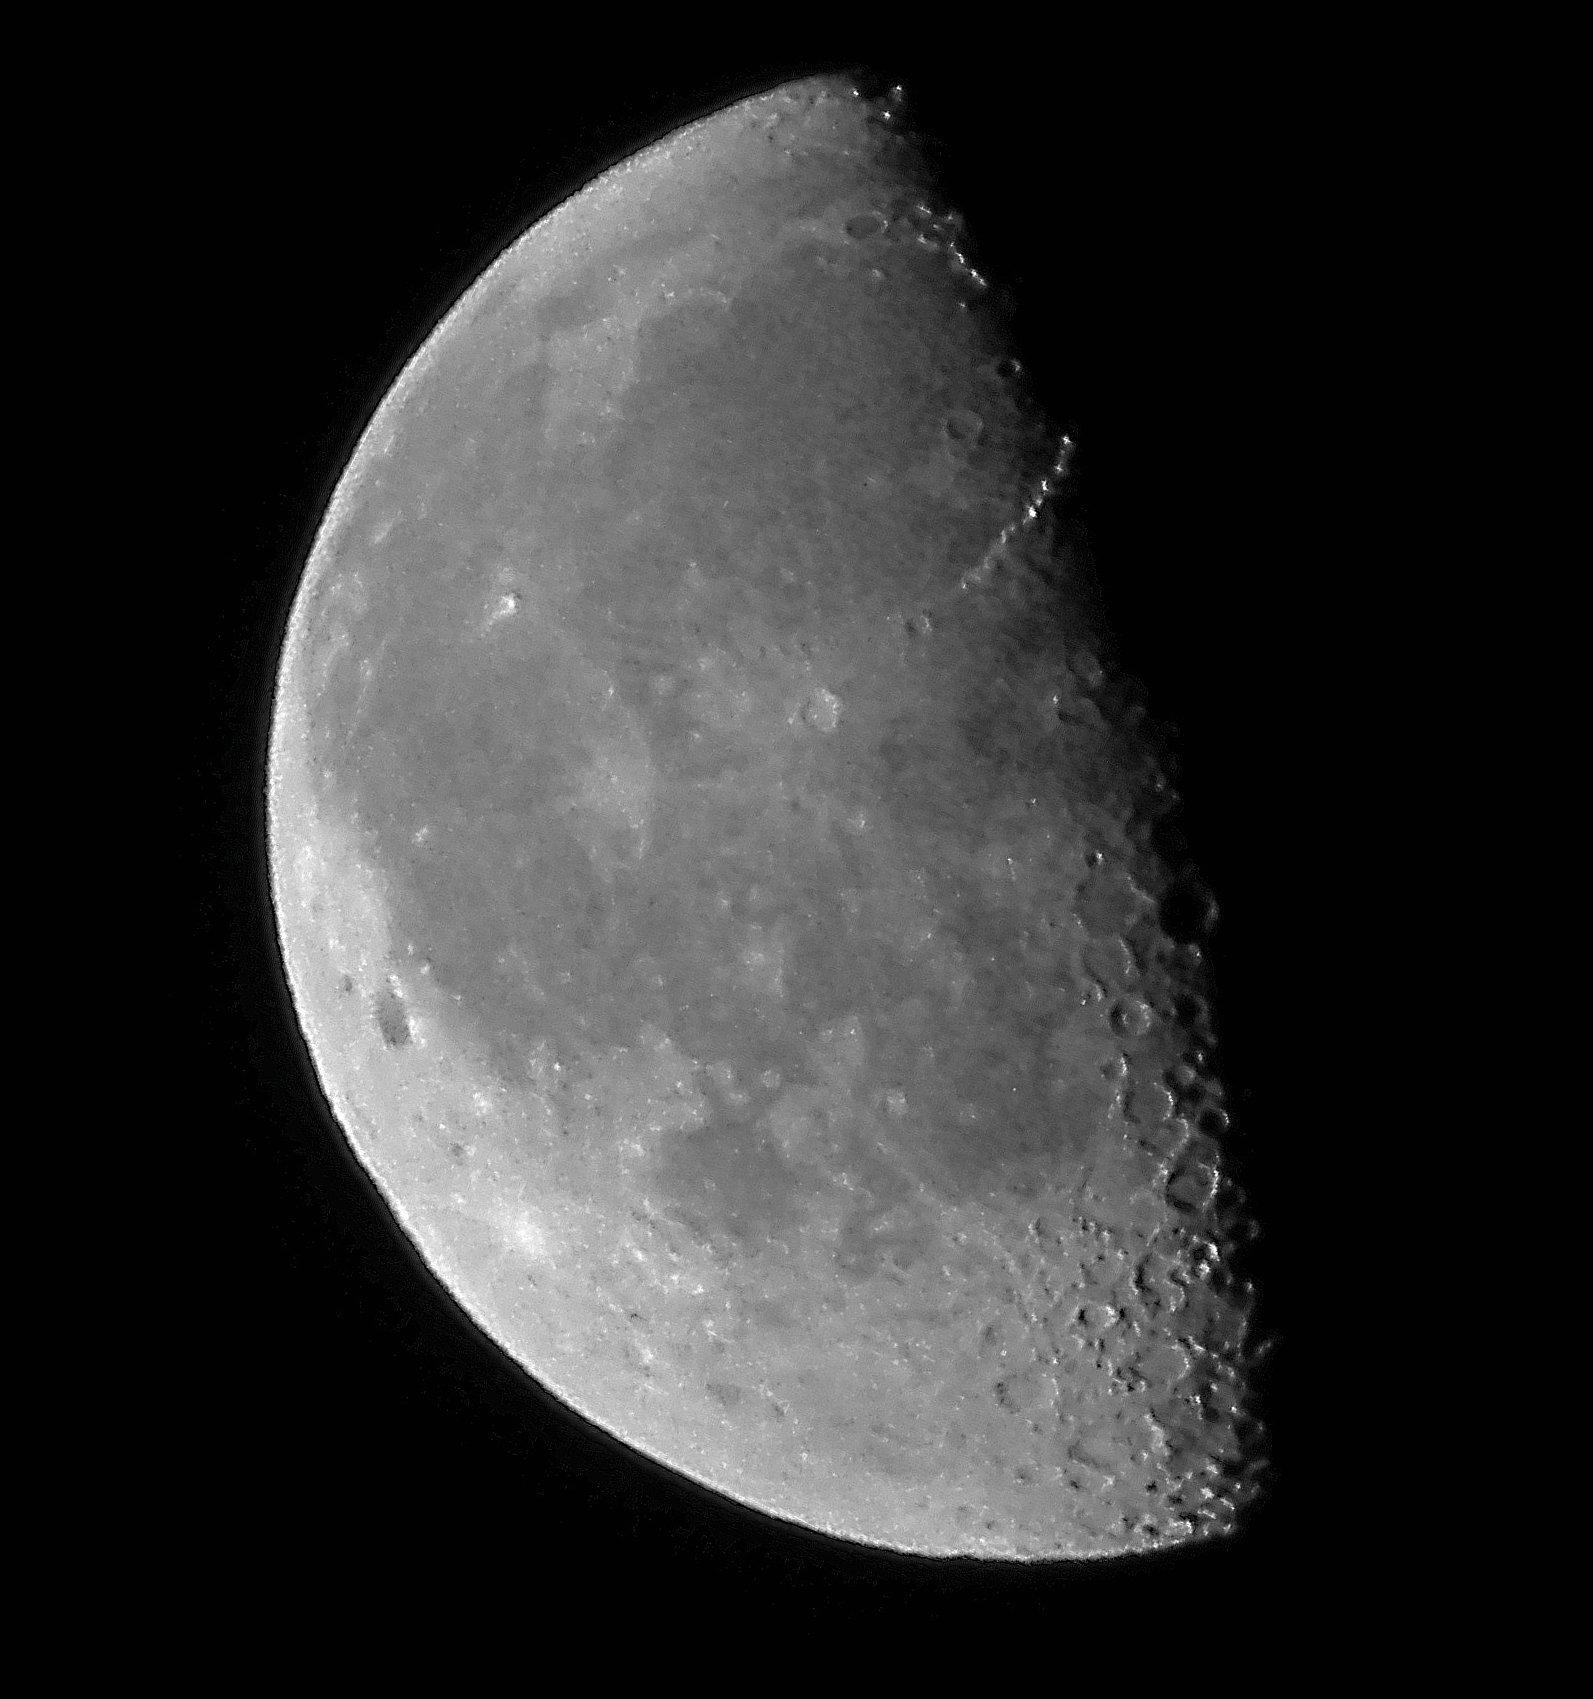 The moon, tonight   Flickr - Photo Sharing!